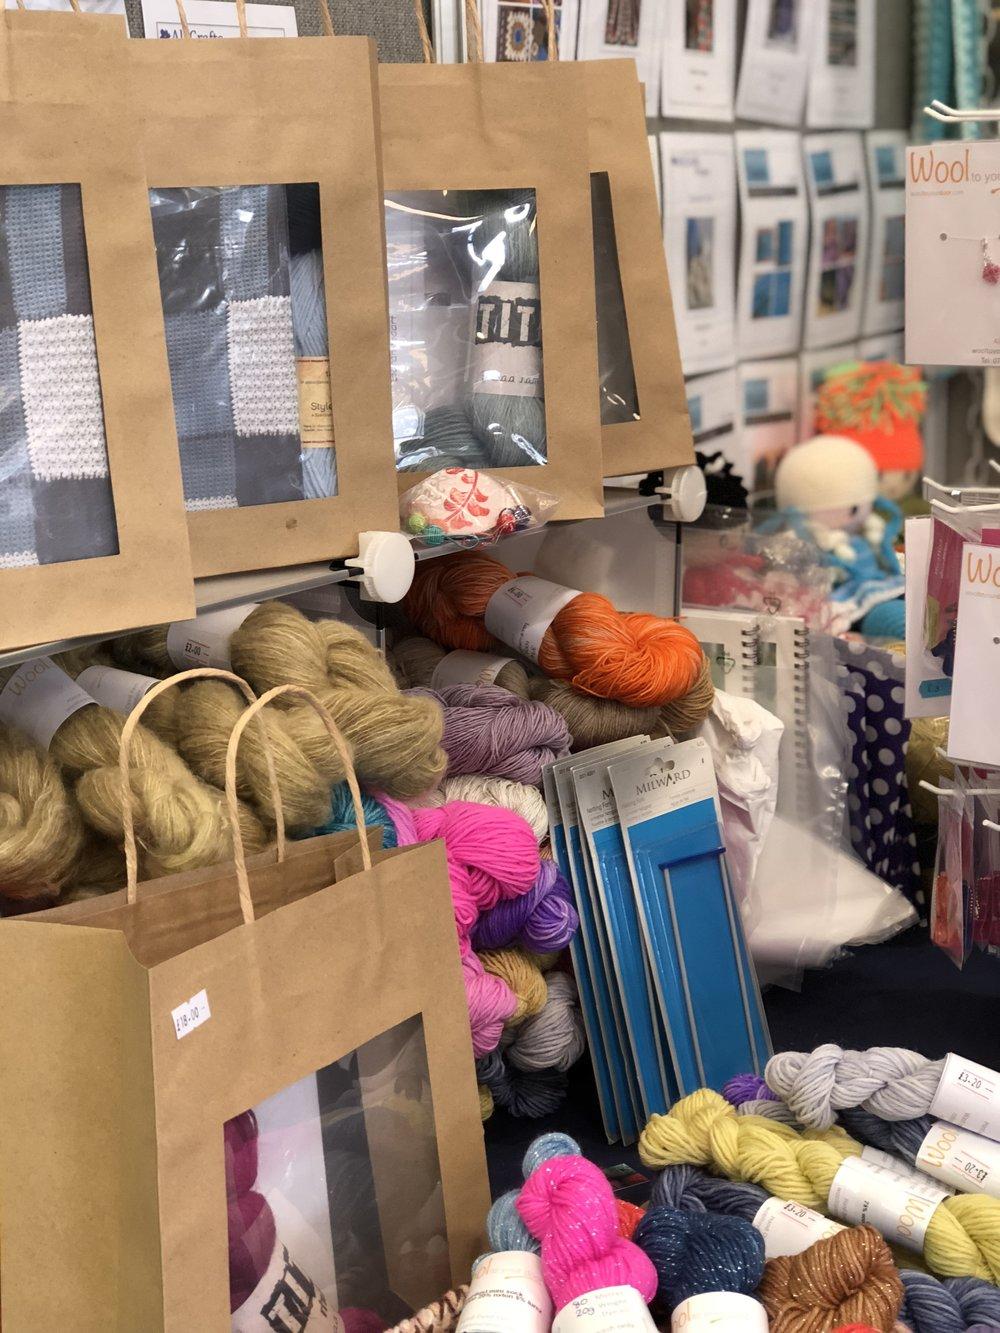 Kits, wool and patterns